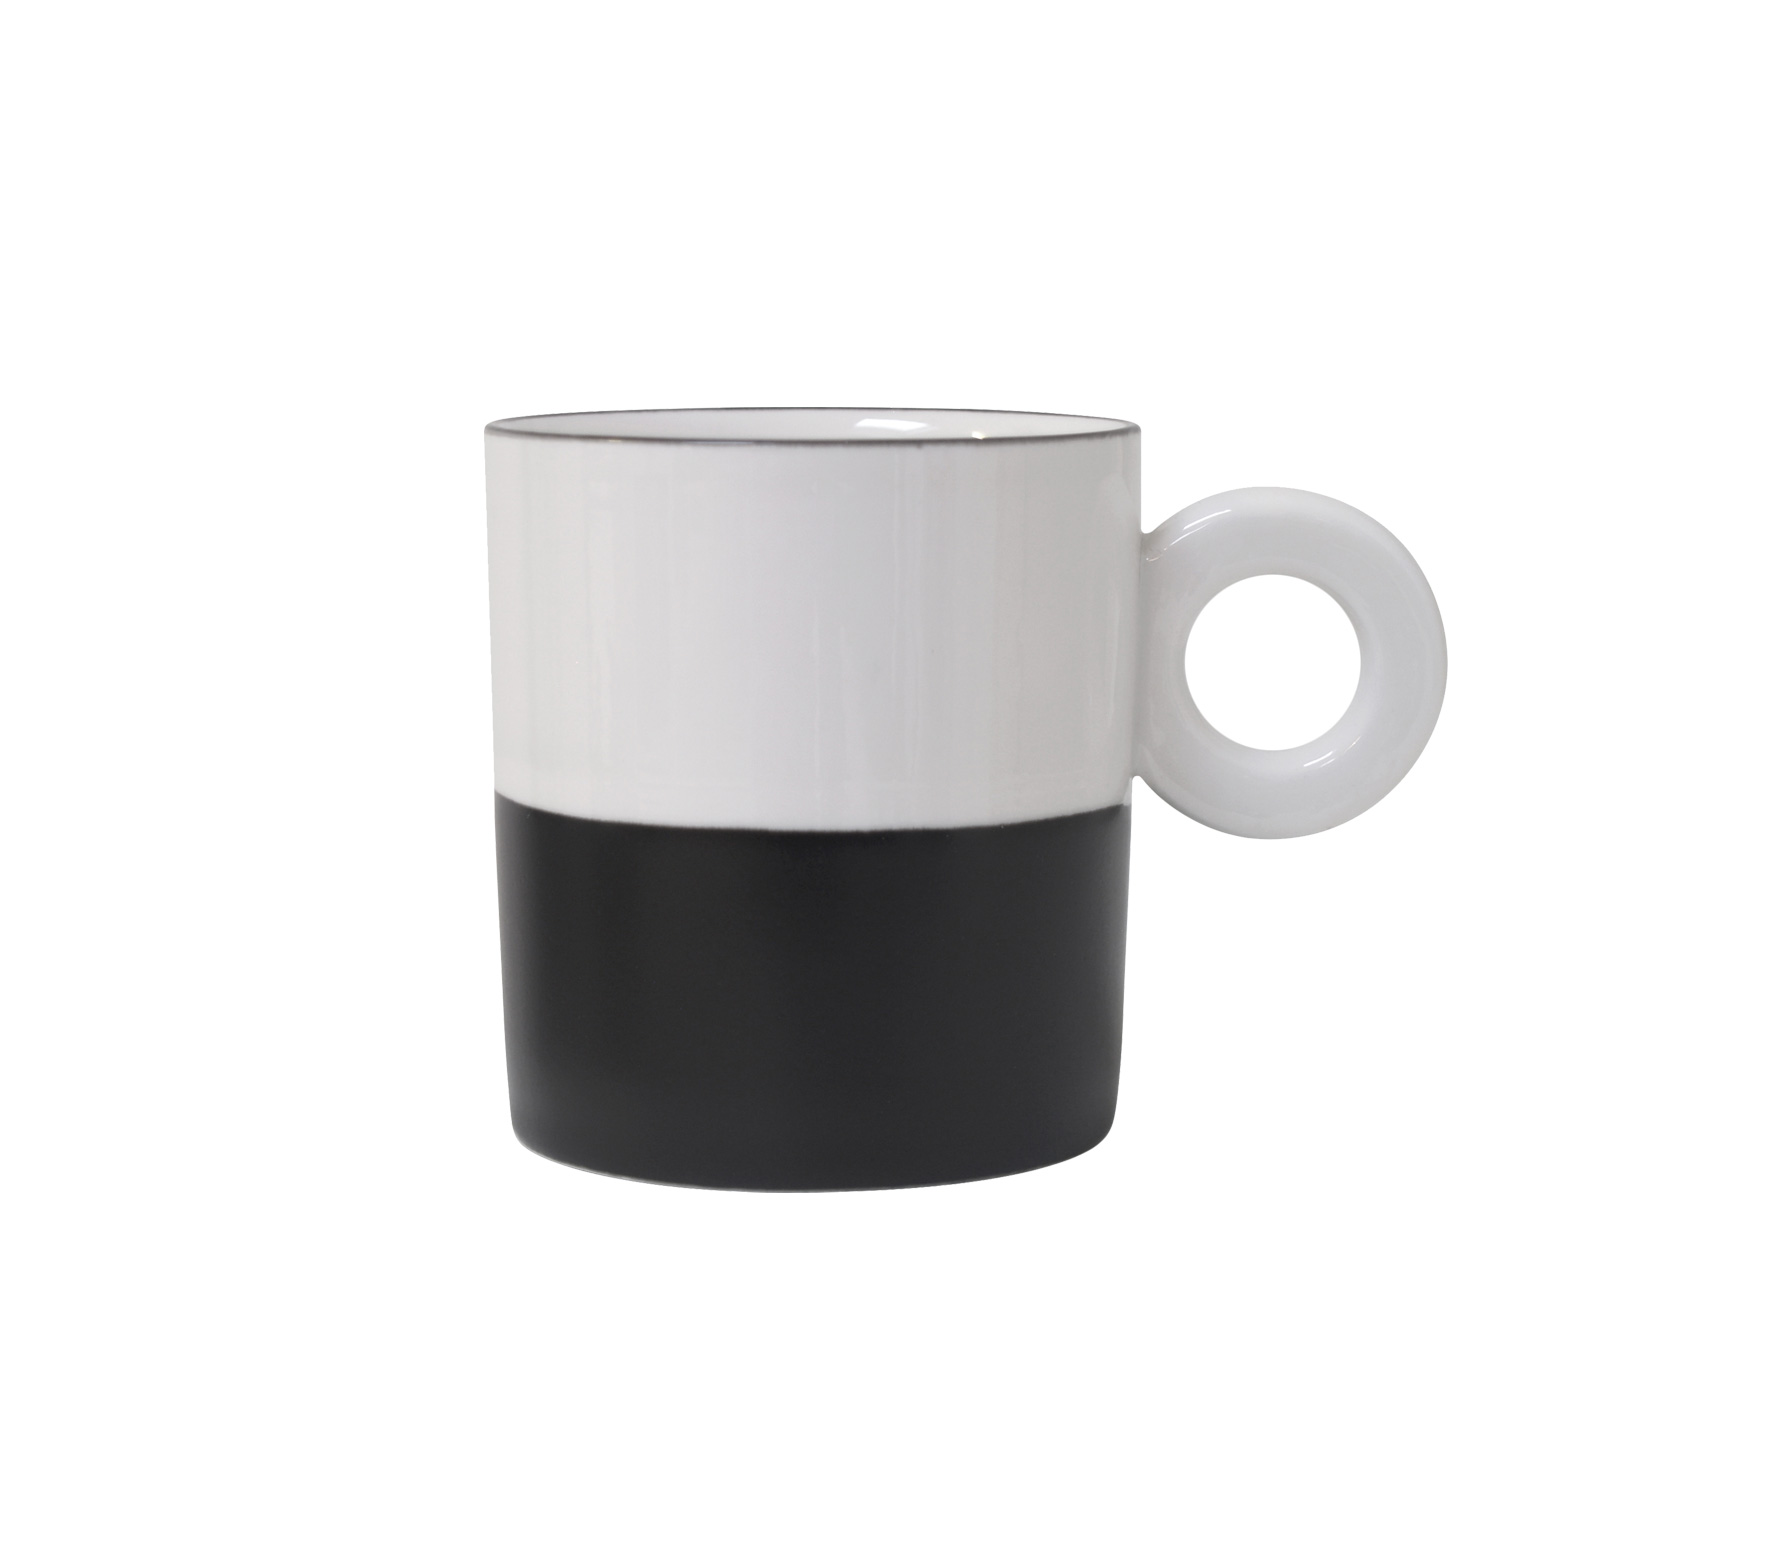 HKLiving Mok zwart wit porcelein Wit met zwart